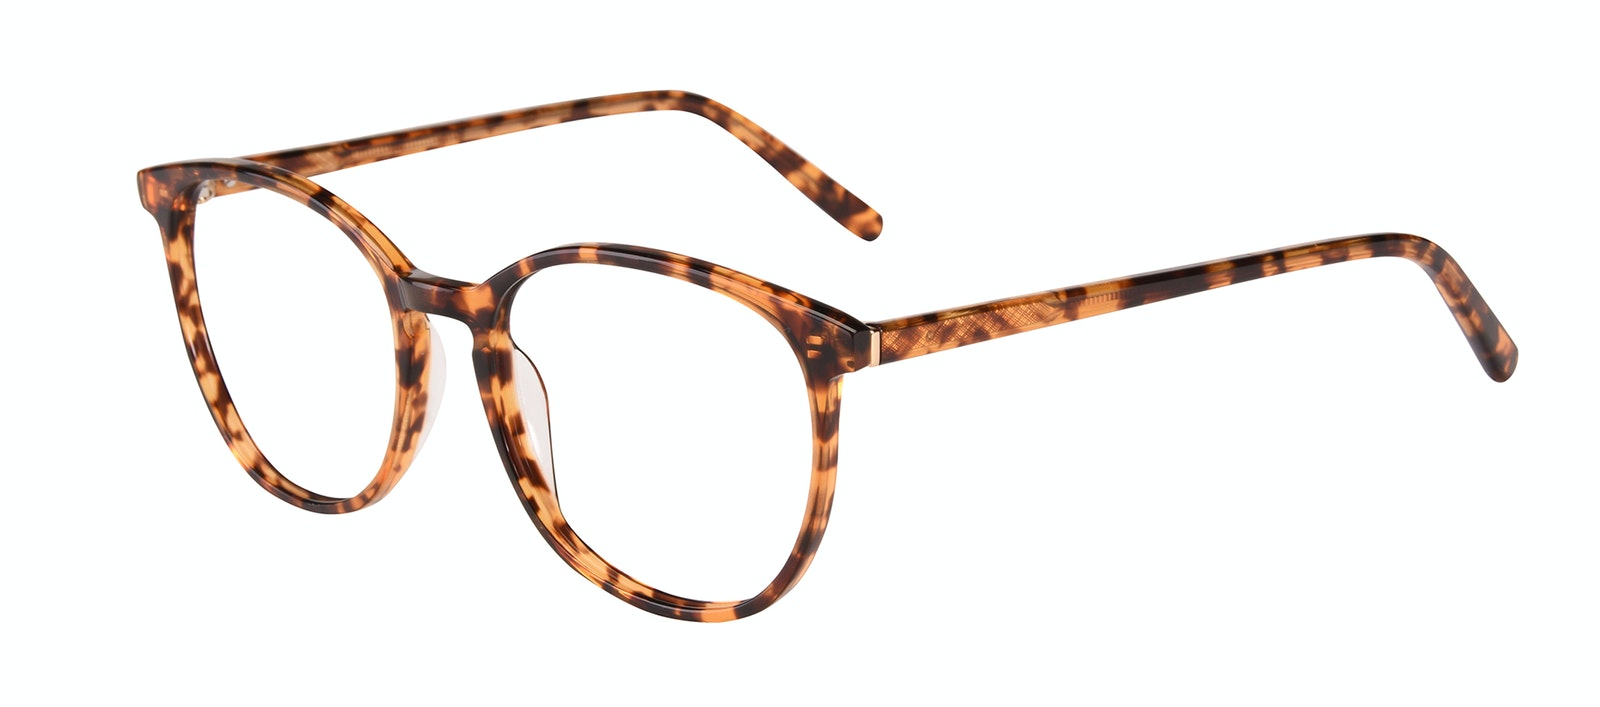 Affordable Fashion Glasses Round Eyeglasses Women Femme Libre Josette Tilt